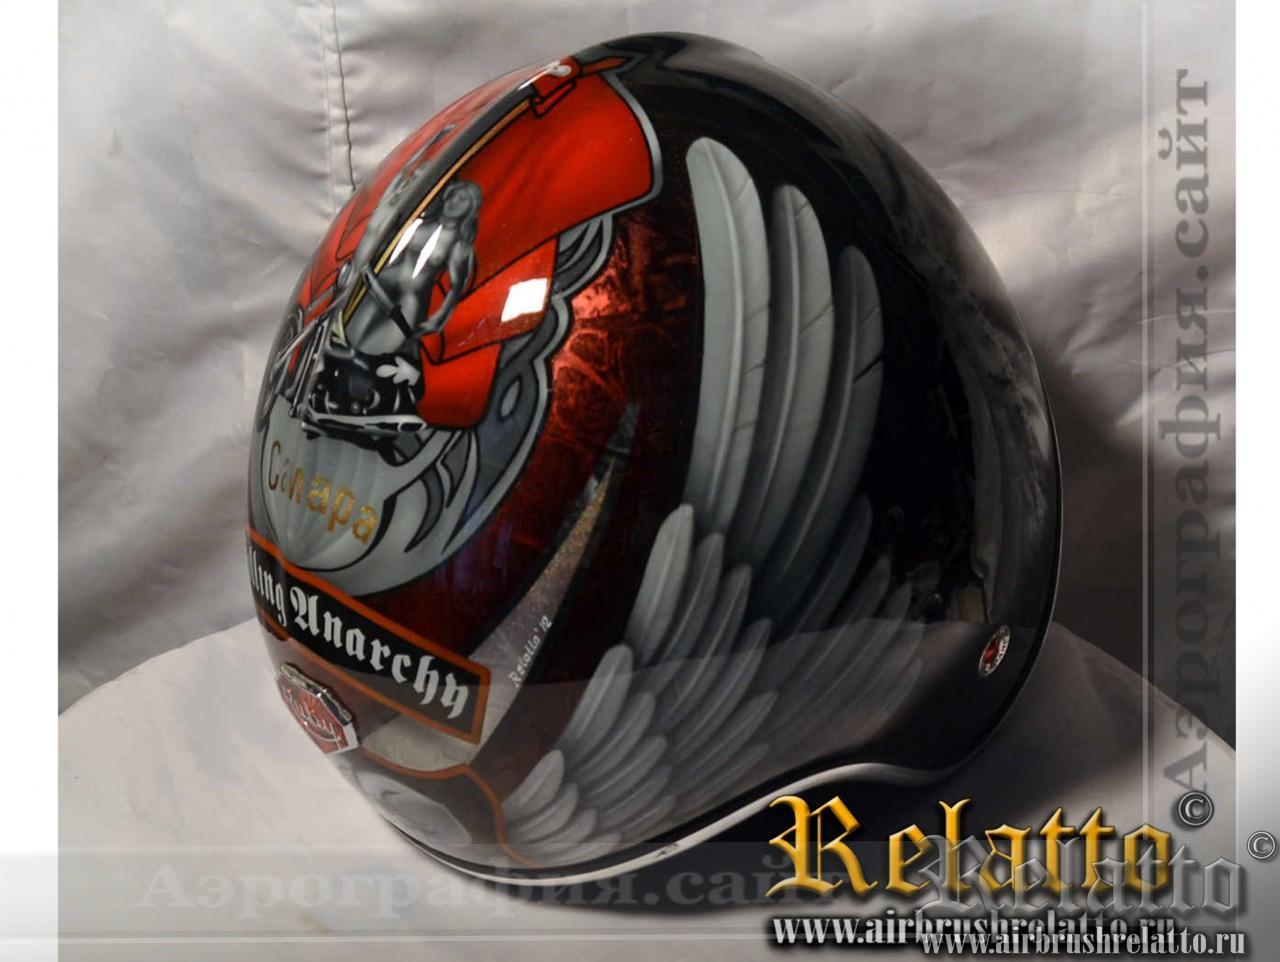 Шлем с аэрографией Роллинг Анархии